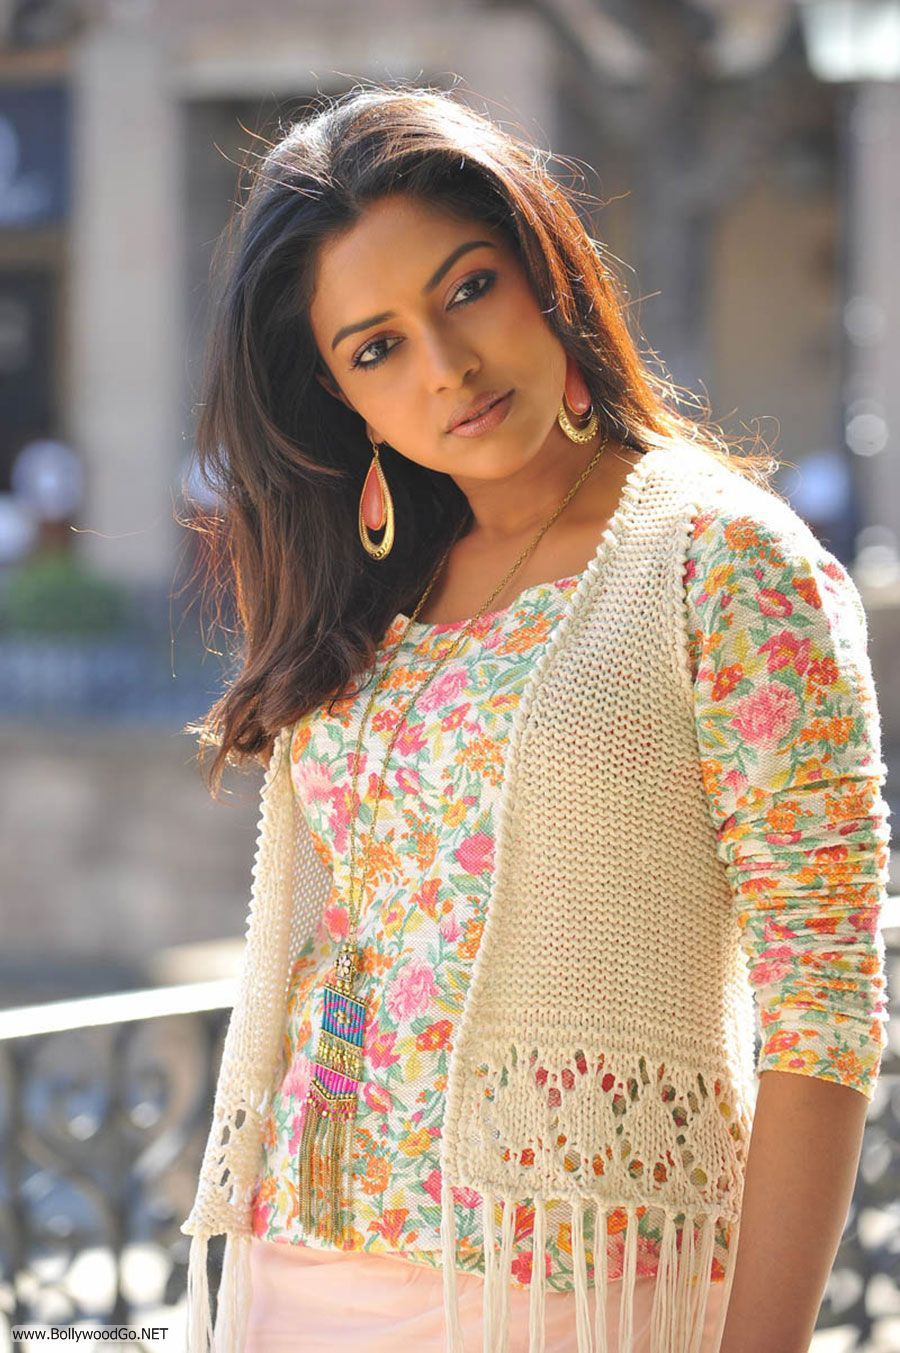 Amala Paul New Stills from Iddarammayilatho Movie AcslLVk8